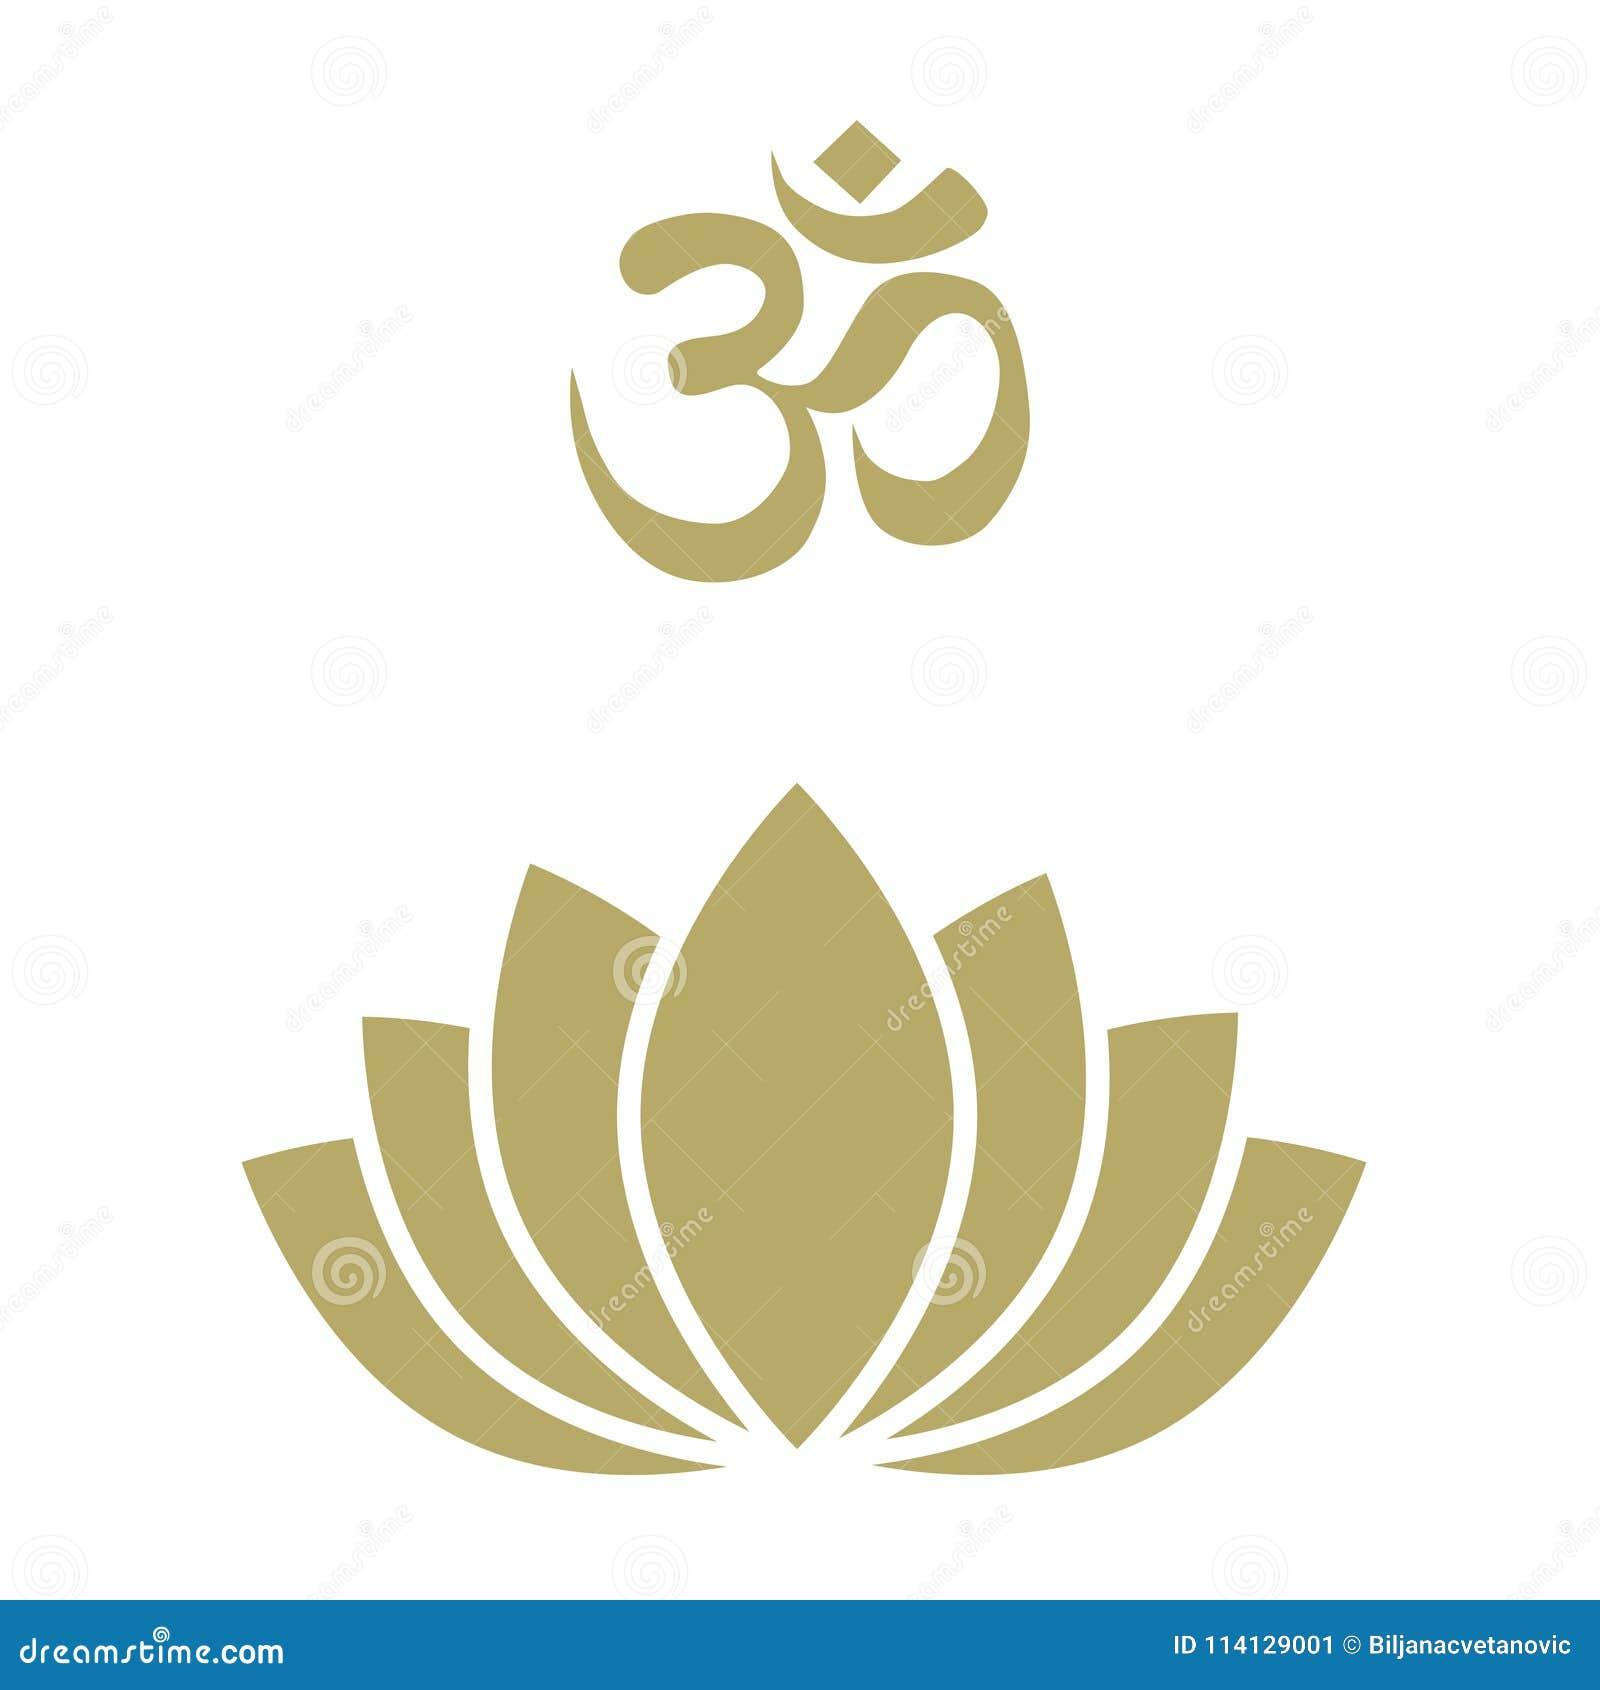 Lotus Flower Logo Stock Vector Illustration Of Cosmetics 114129001